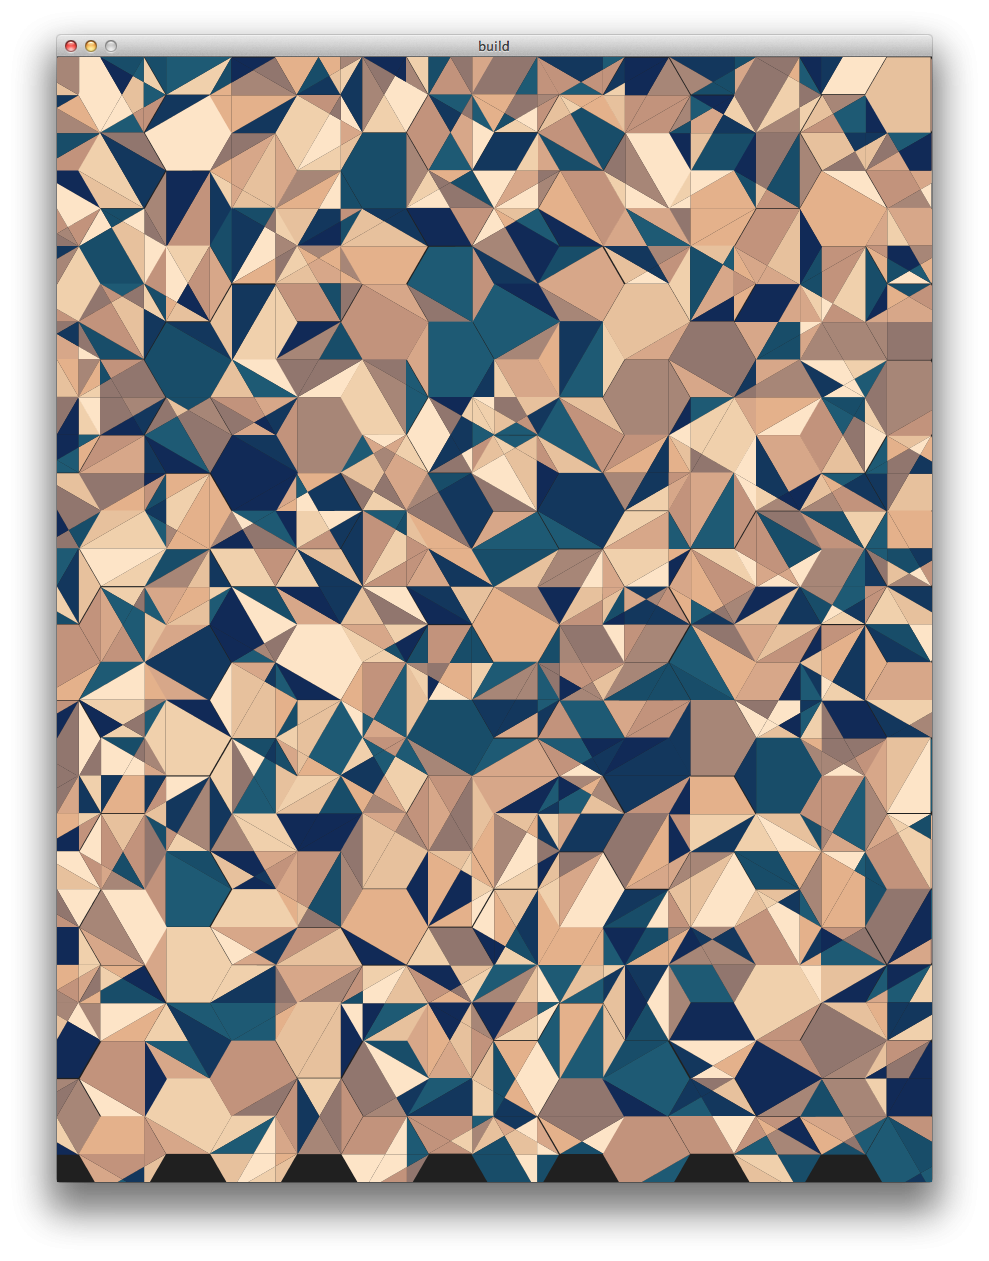 Generative Art Project - image 4 - student project